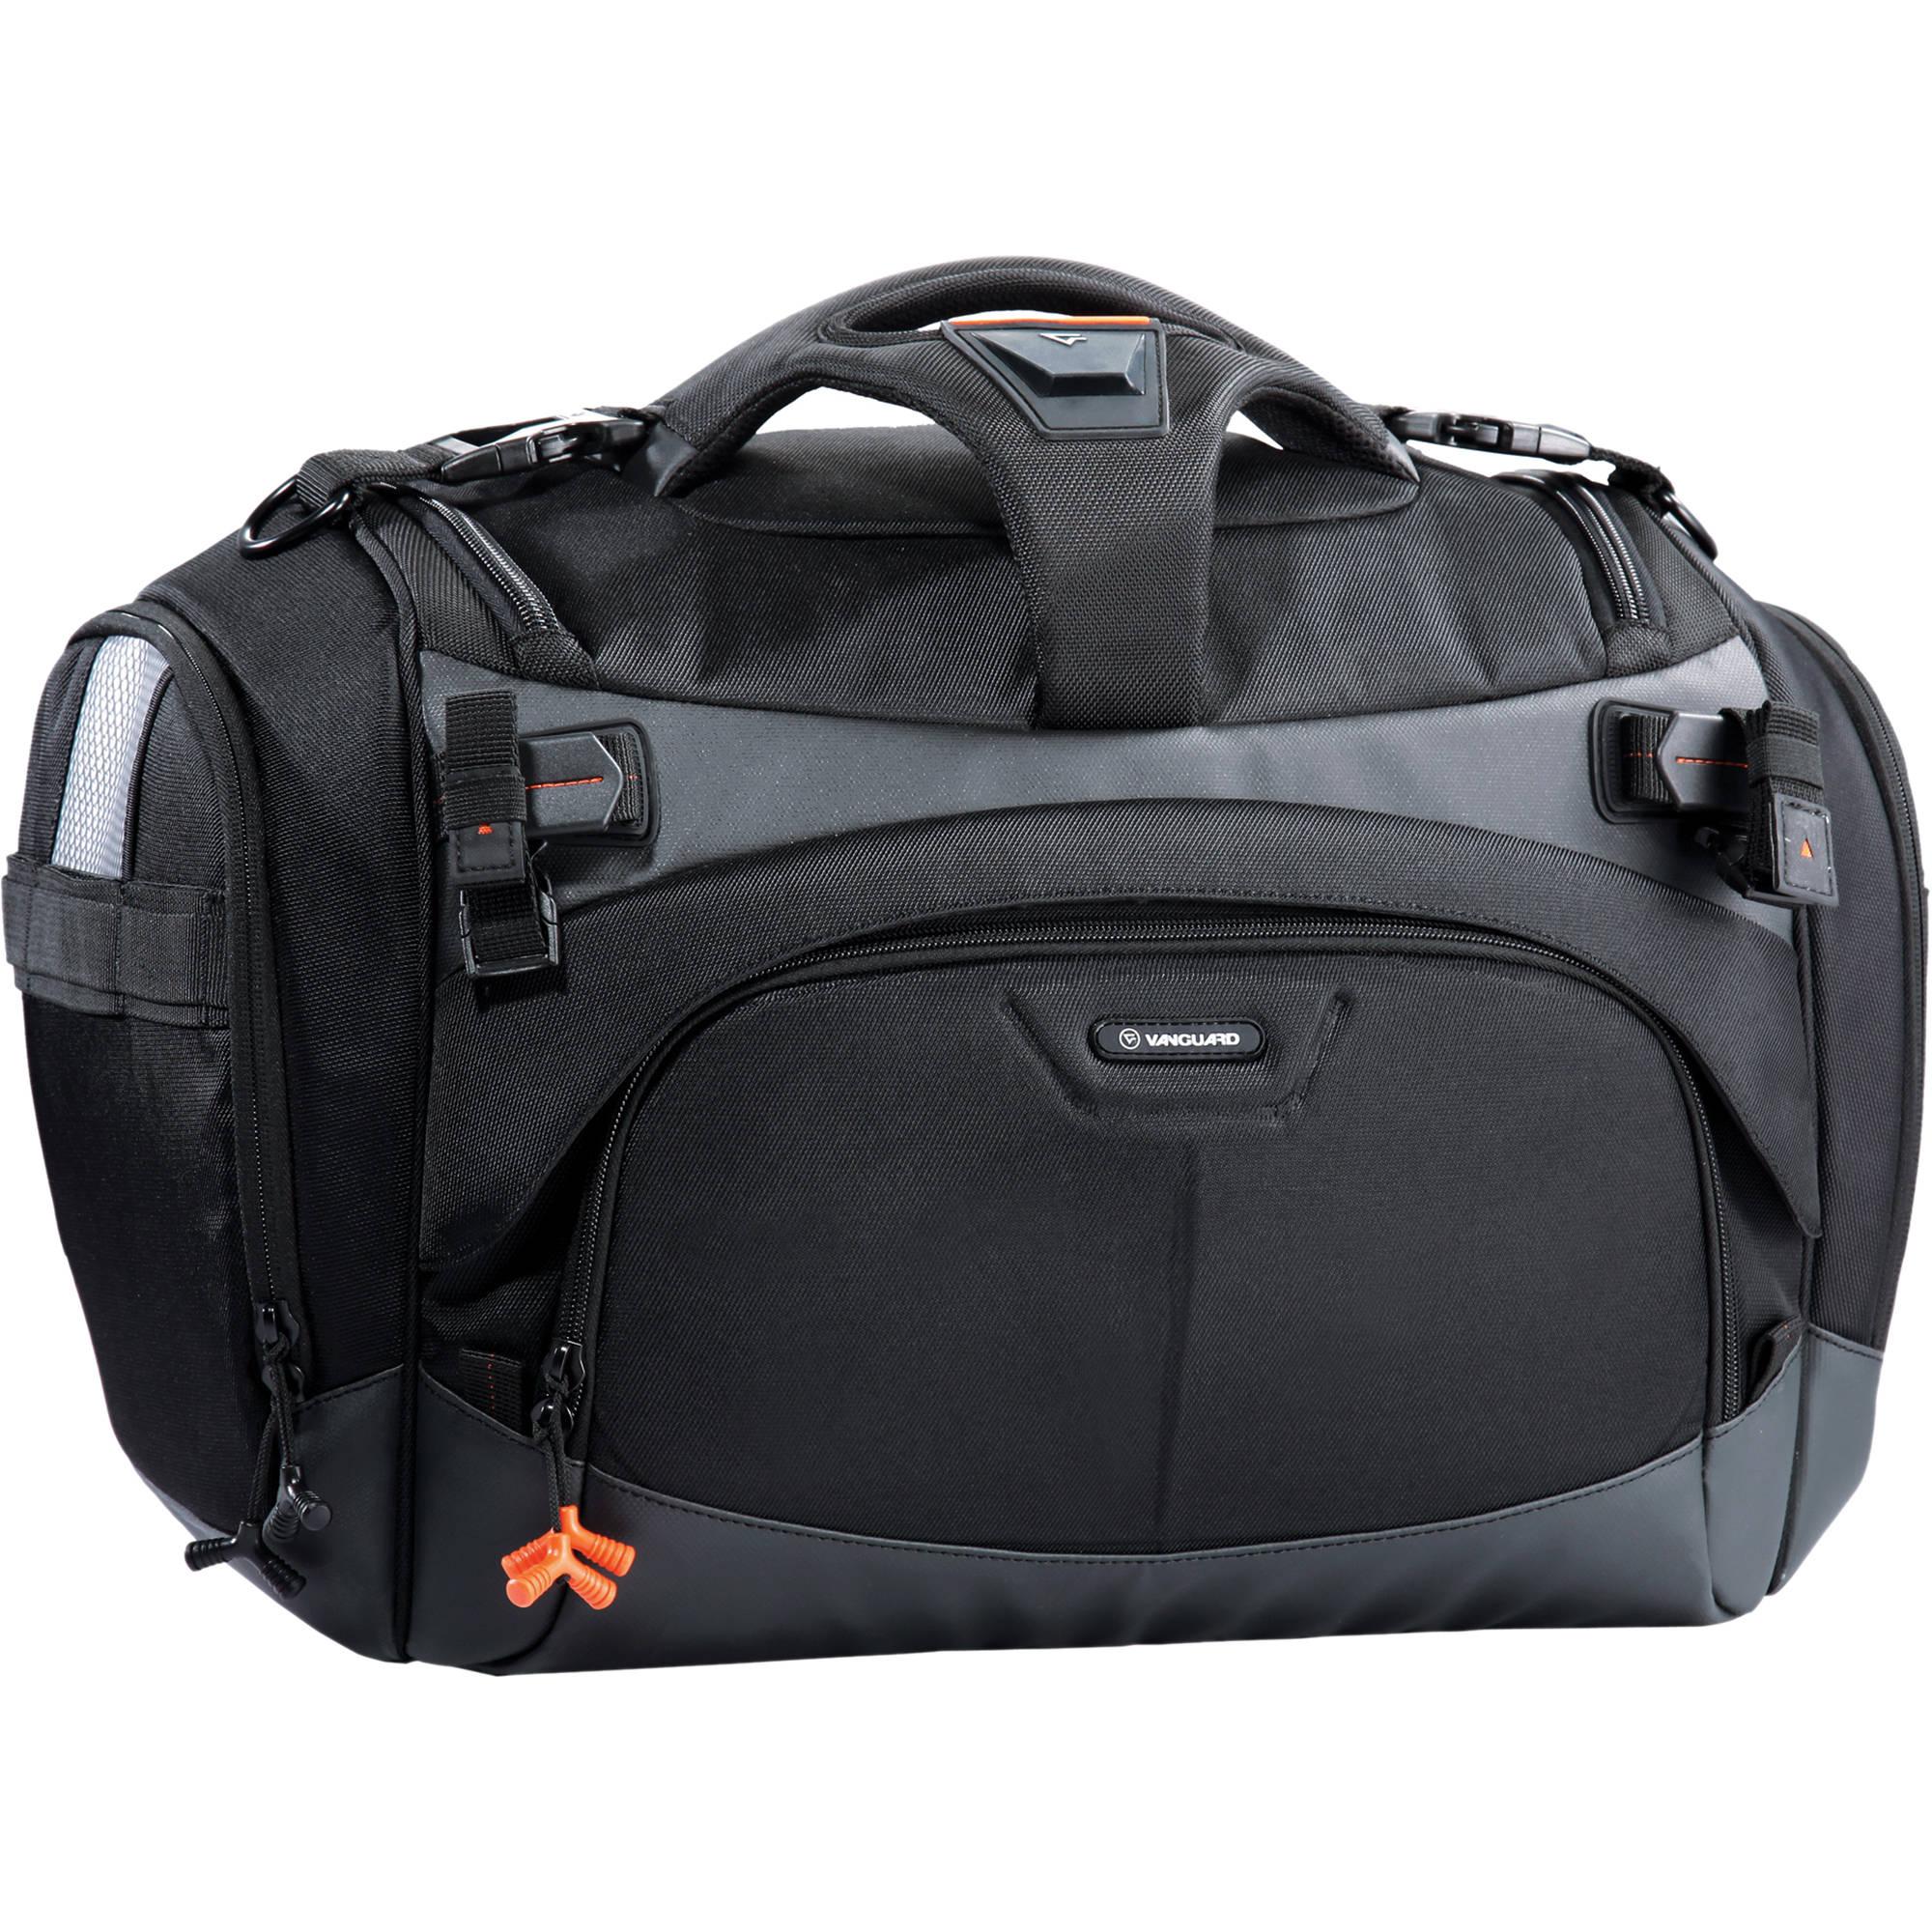 Vanguard Xcenior Series Shoulder Bag 116